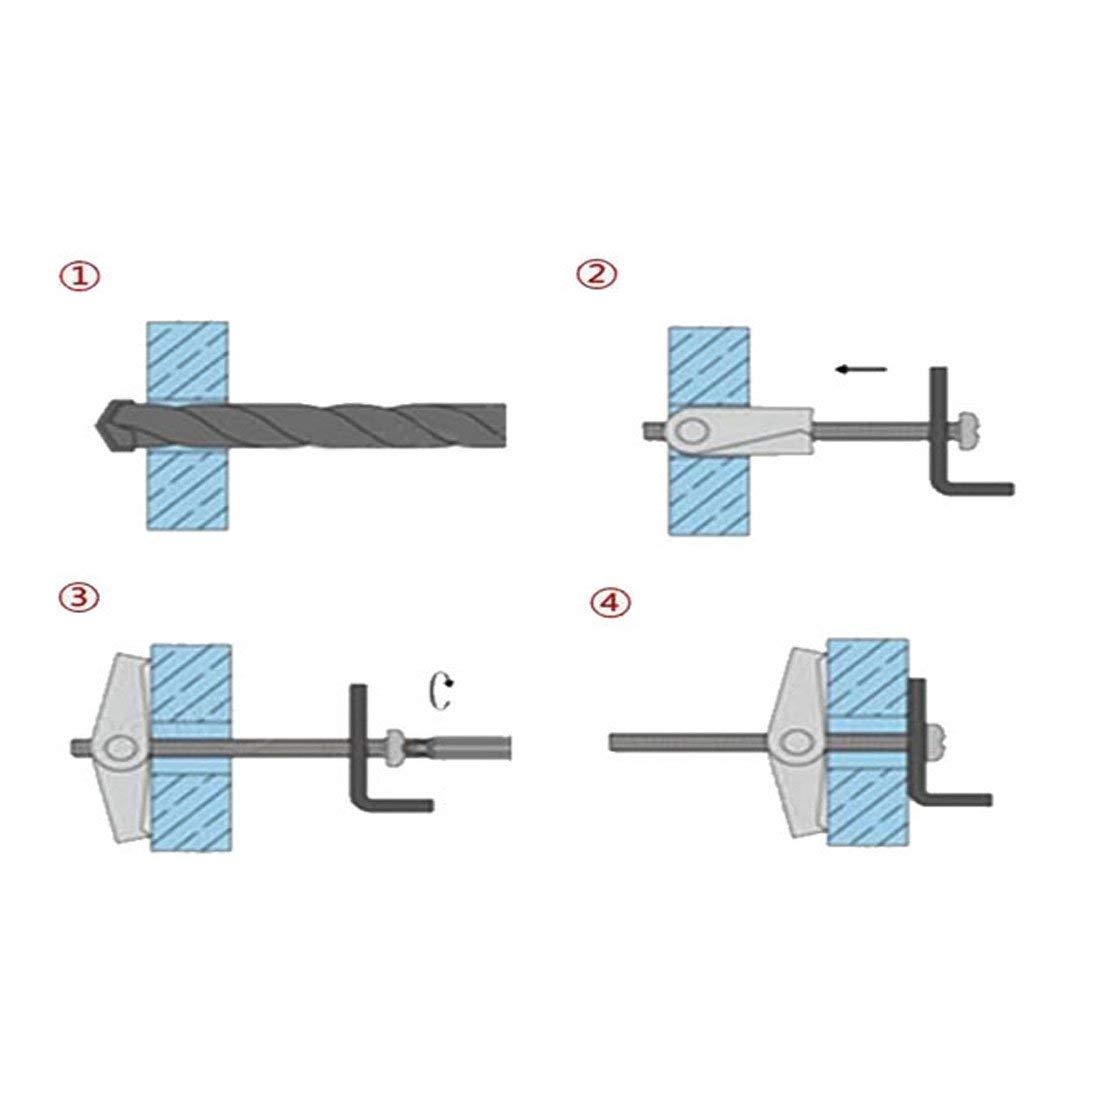 3mm x 50mm Male Thread Spring Screws Hollow plasterboard Cavity Wall Bolts